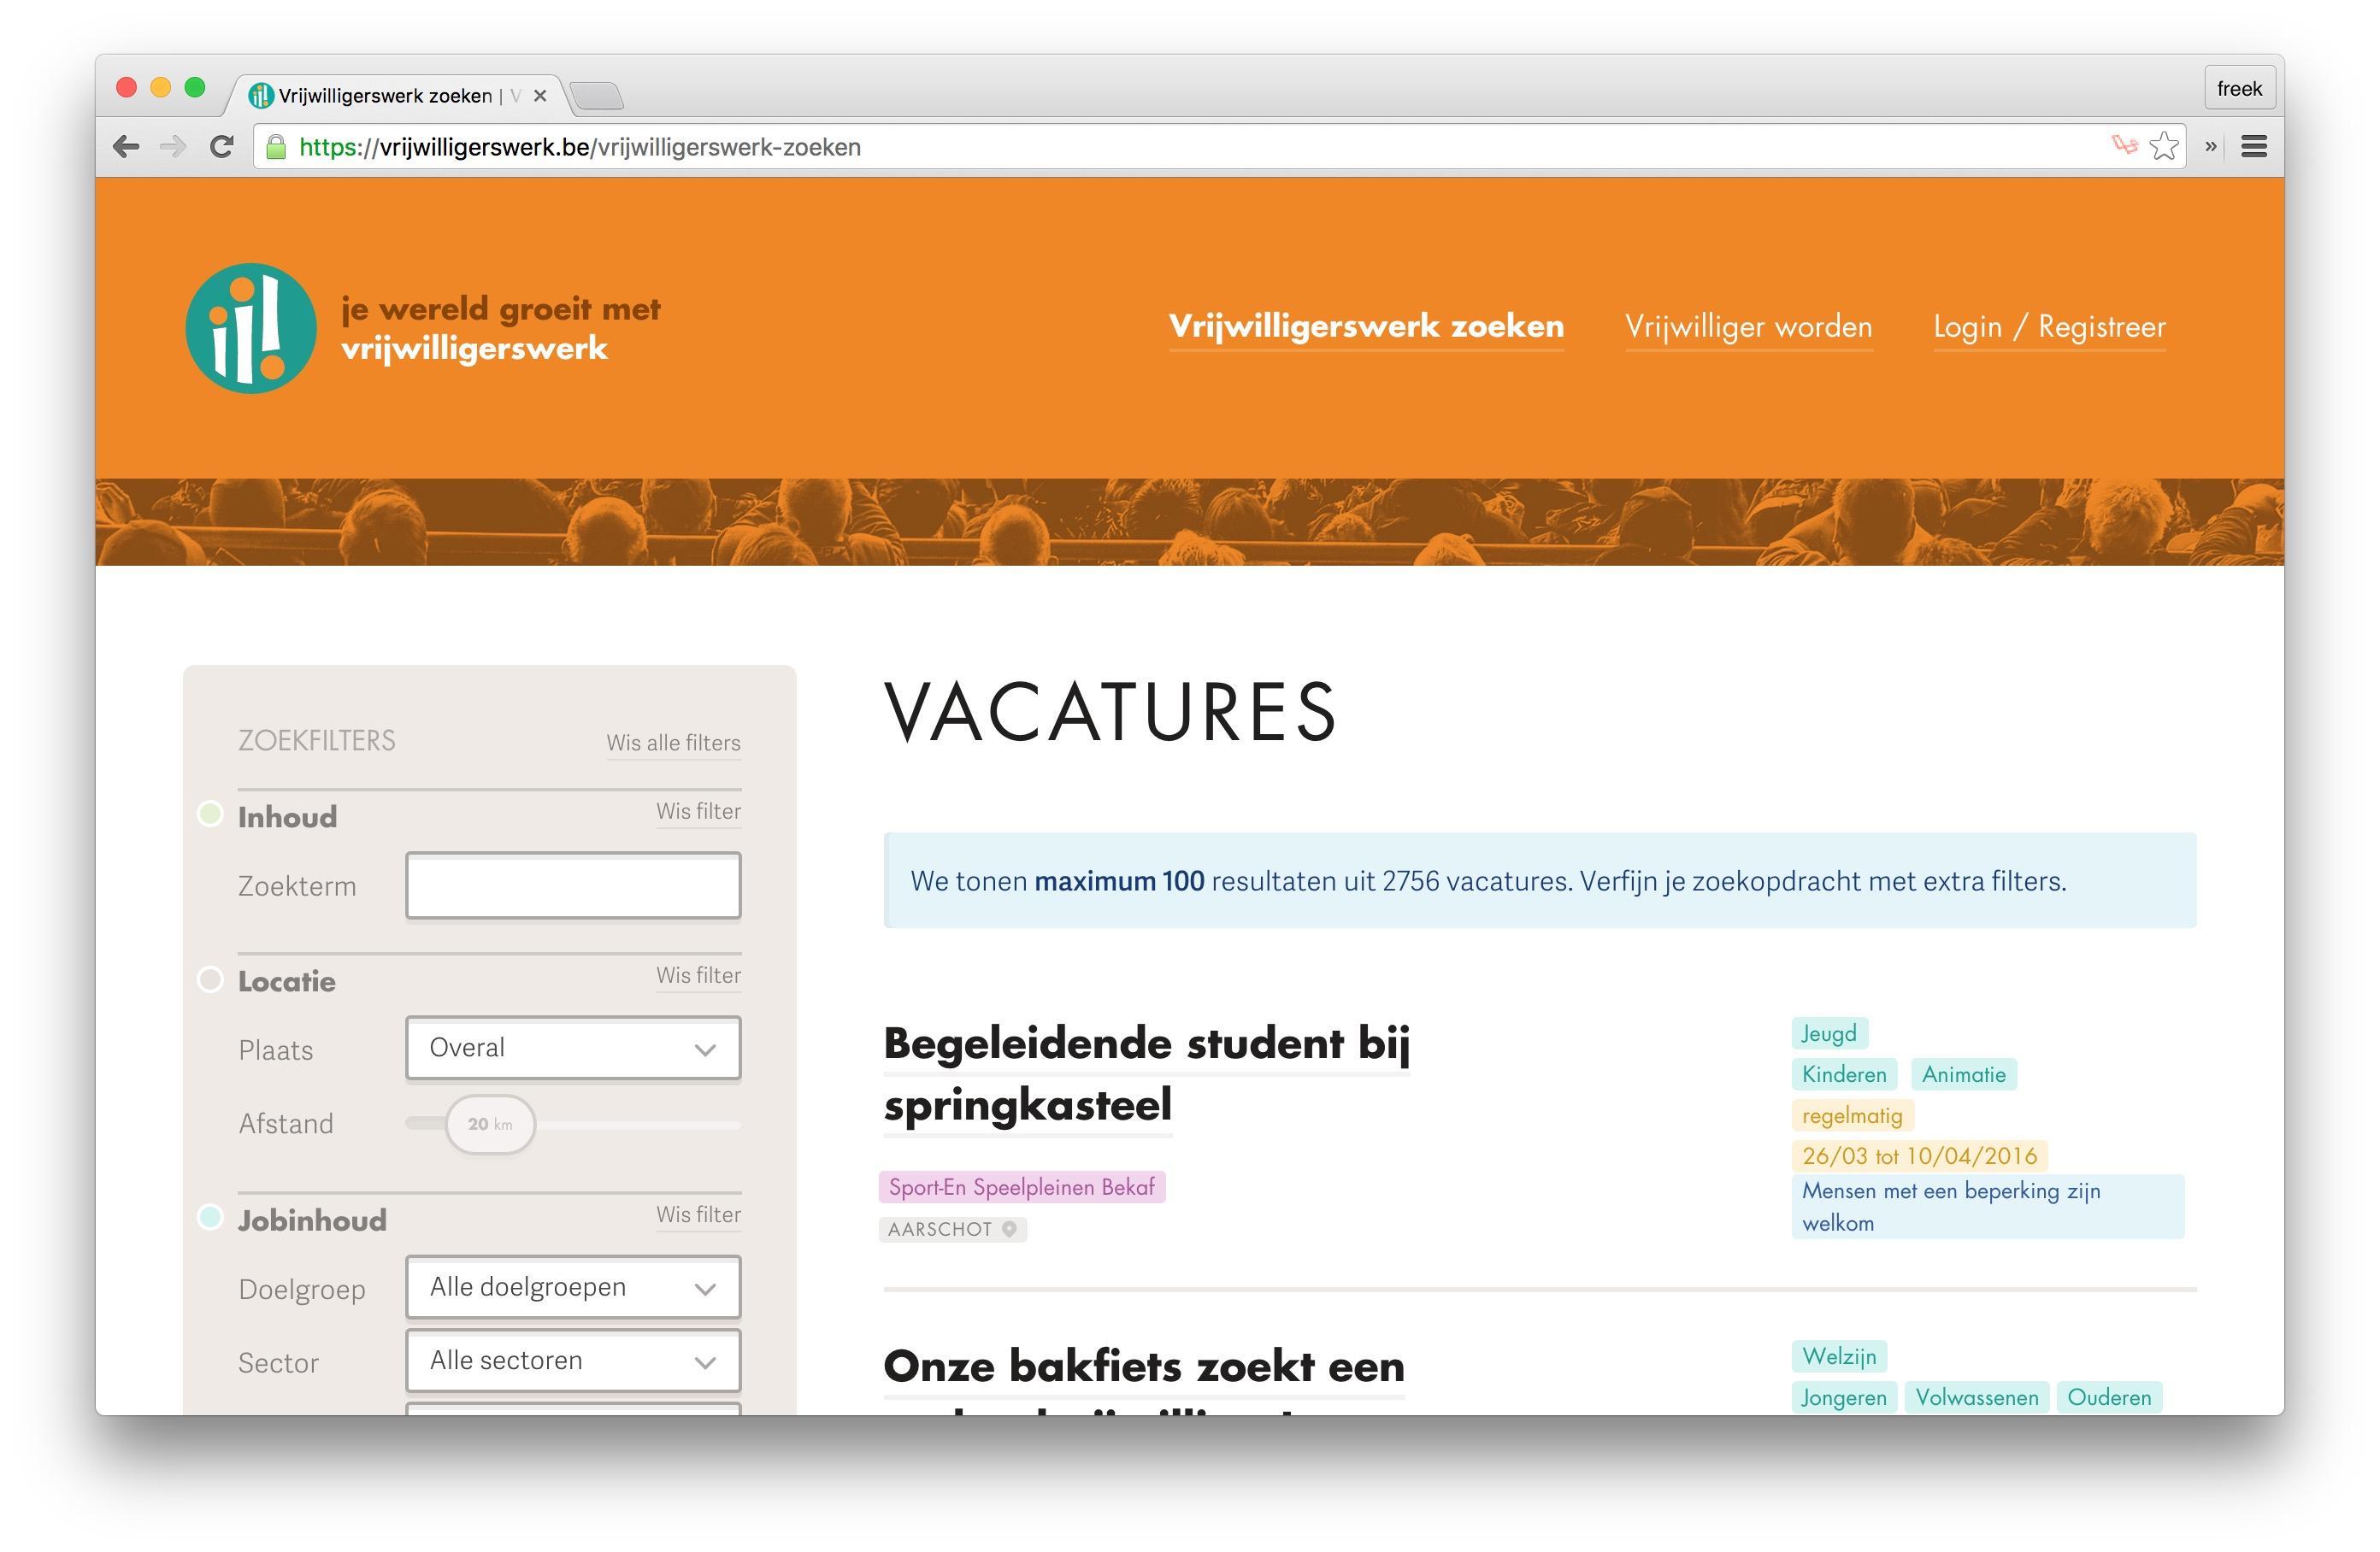 Integrating Algolia in a Laravel application - Freek Van der